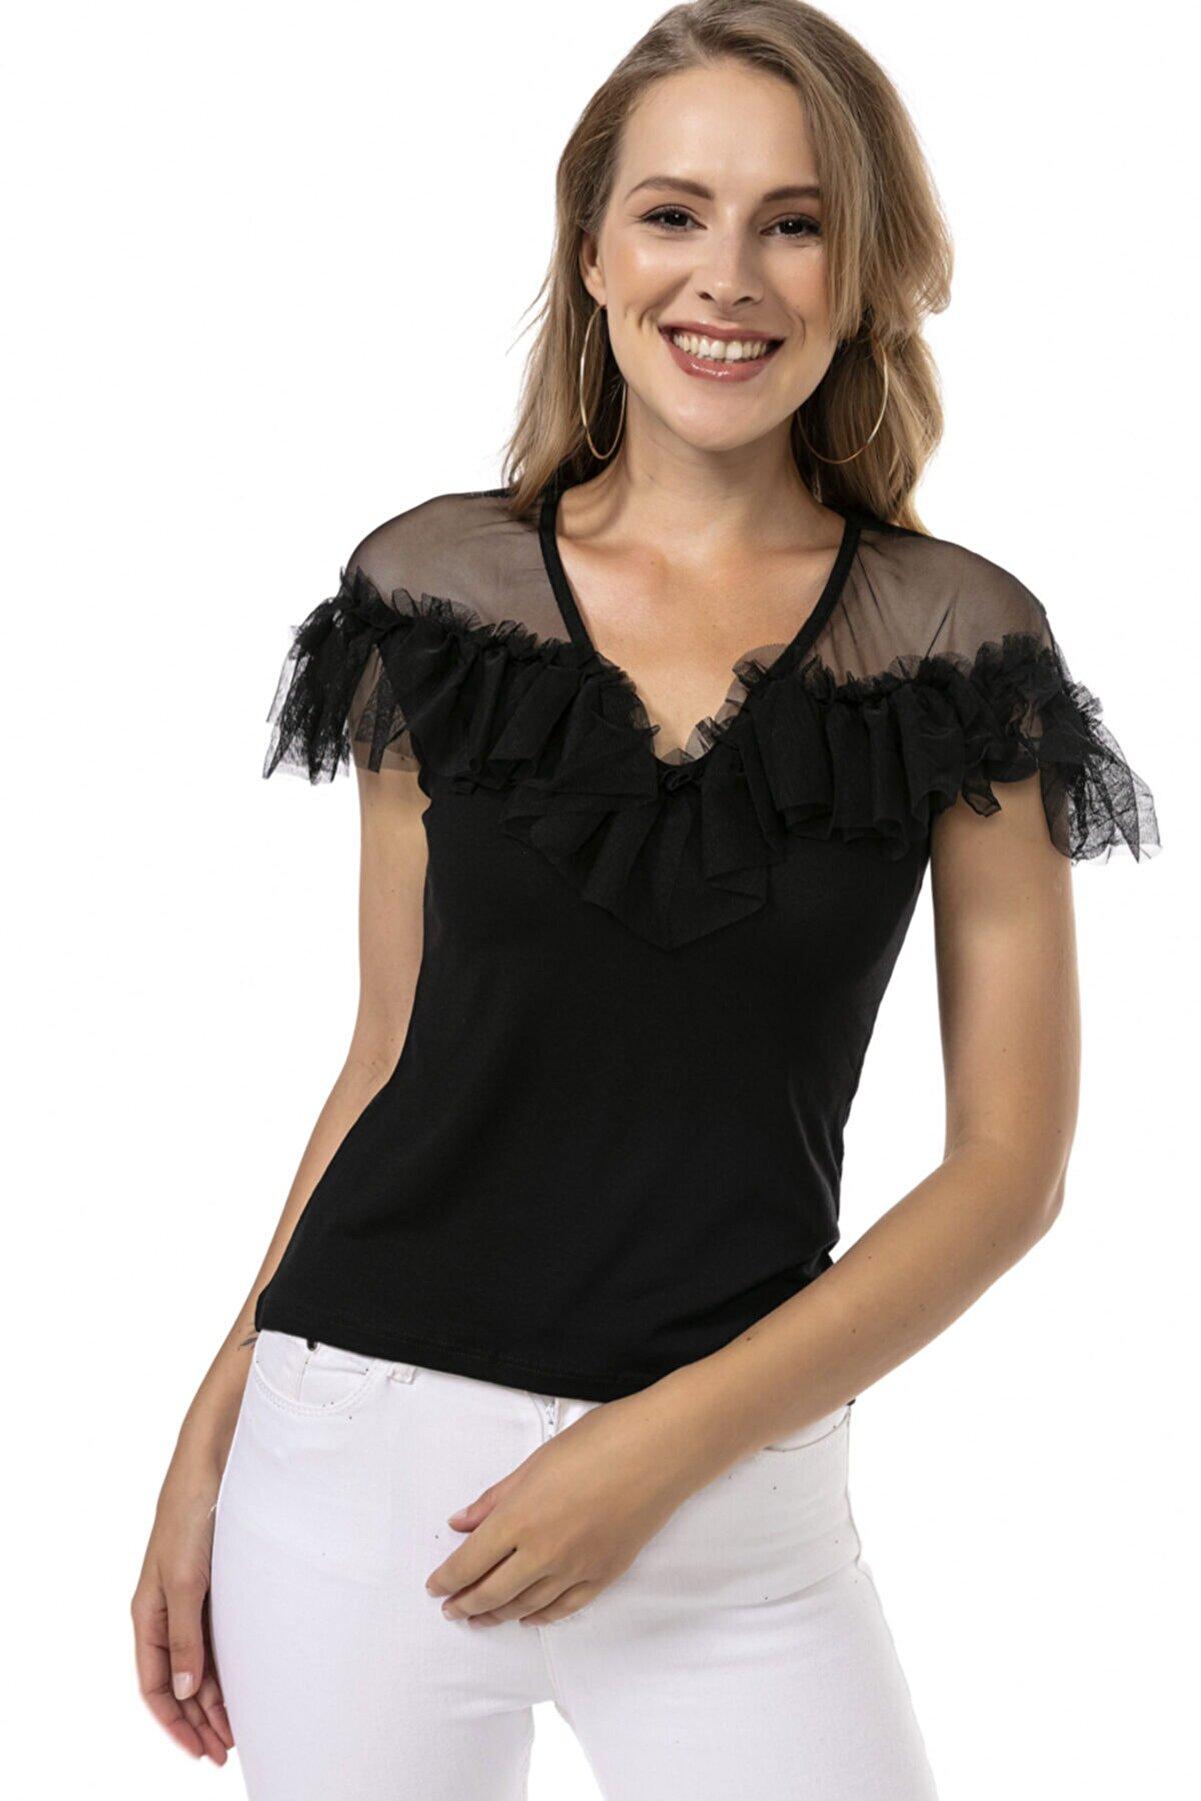 Modagusto Siyah V Yaka Tül Detaylı Kısa Kol Bluz